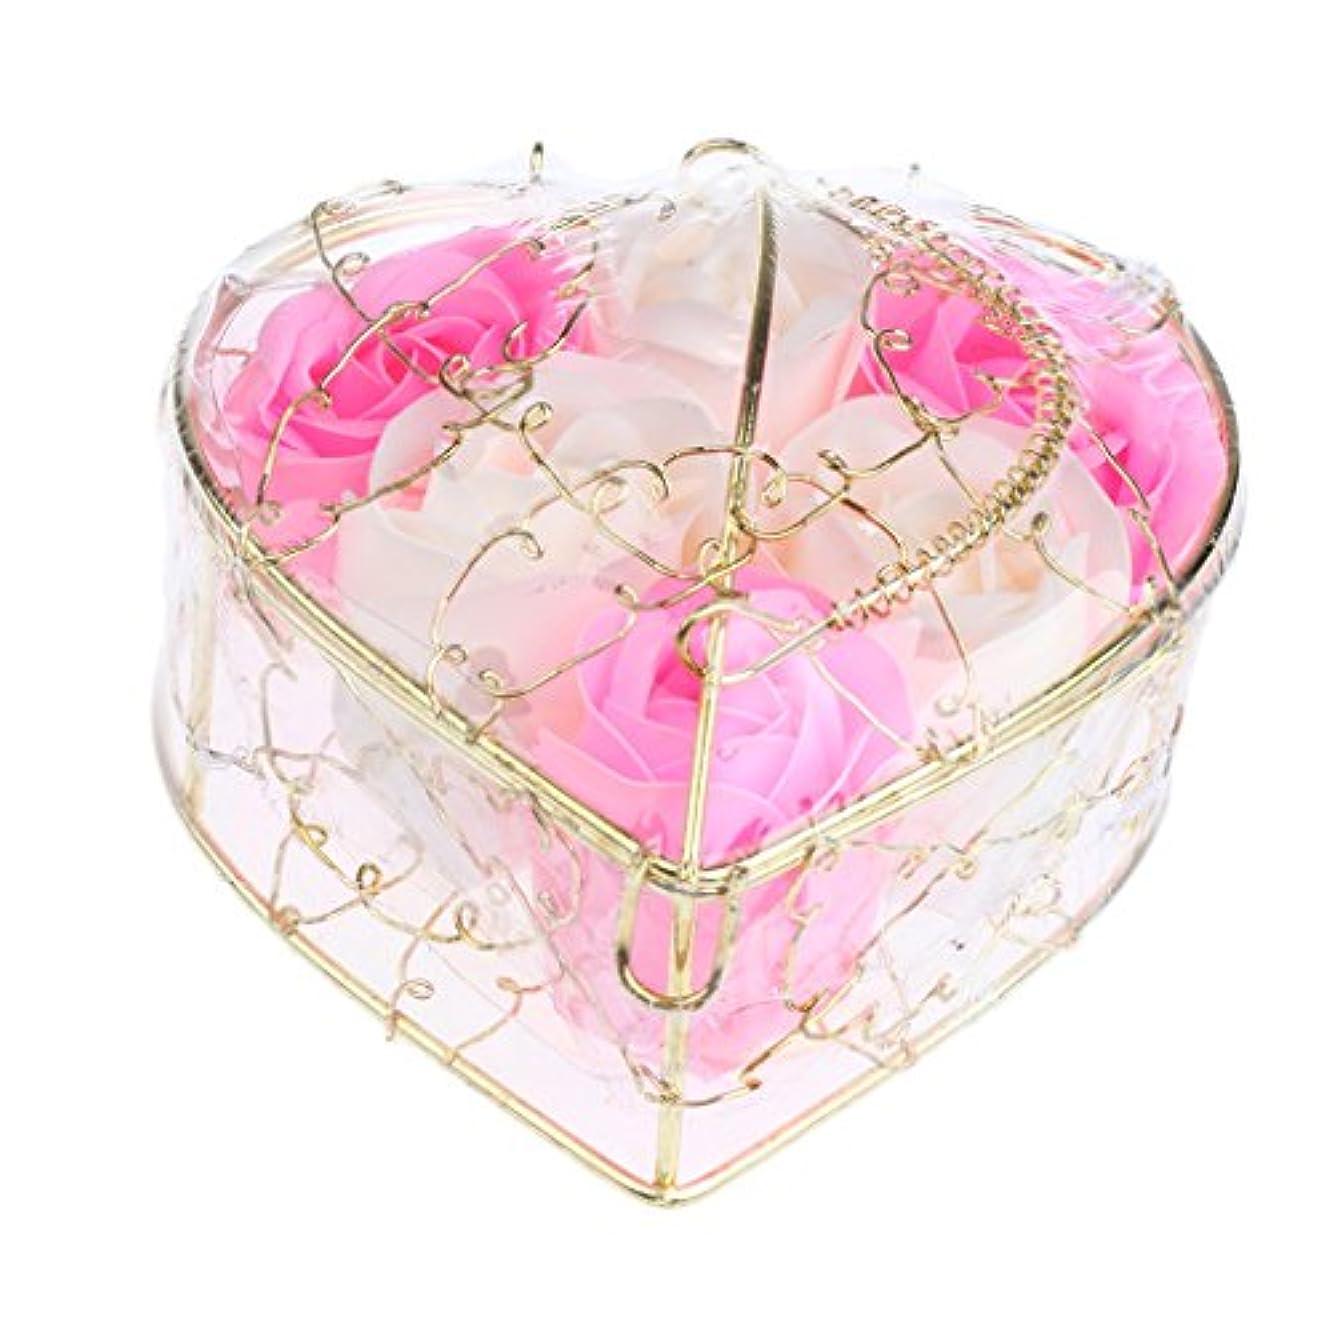 IPOTCH 6個 ソープフラワー 石鹸花 造花 バラ フラワー ギフトボックス 誕生日 母の日 記念日 先生の日 プレゼント 全5仕様選べる - ピンクとホワイト